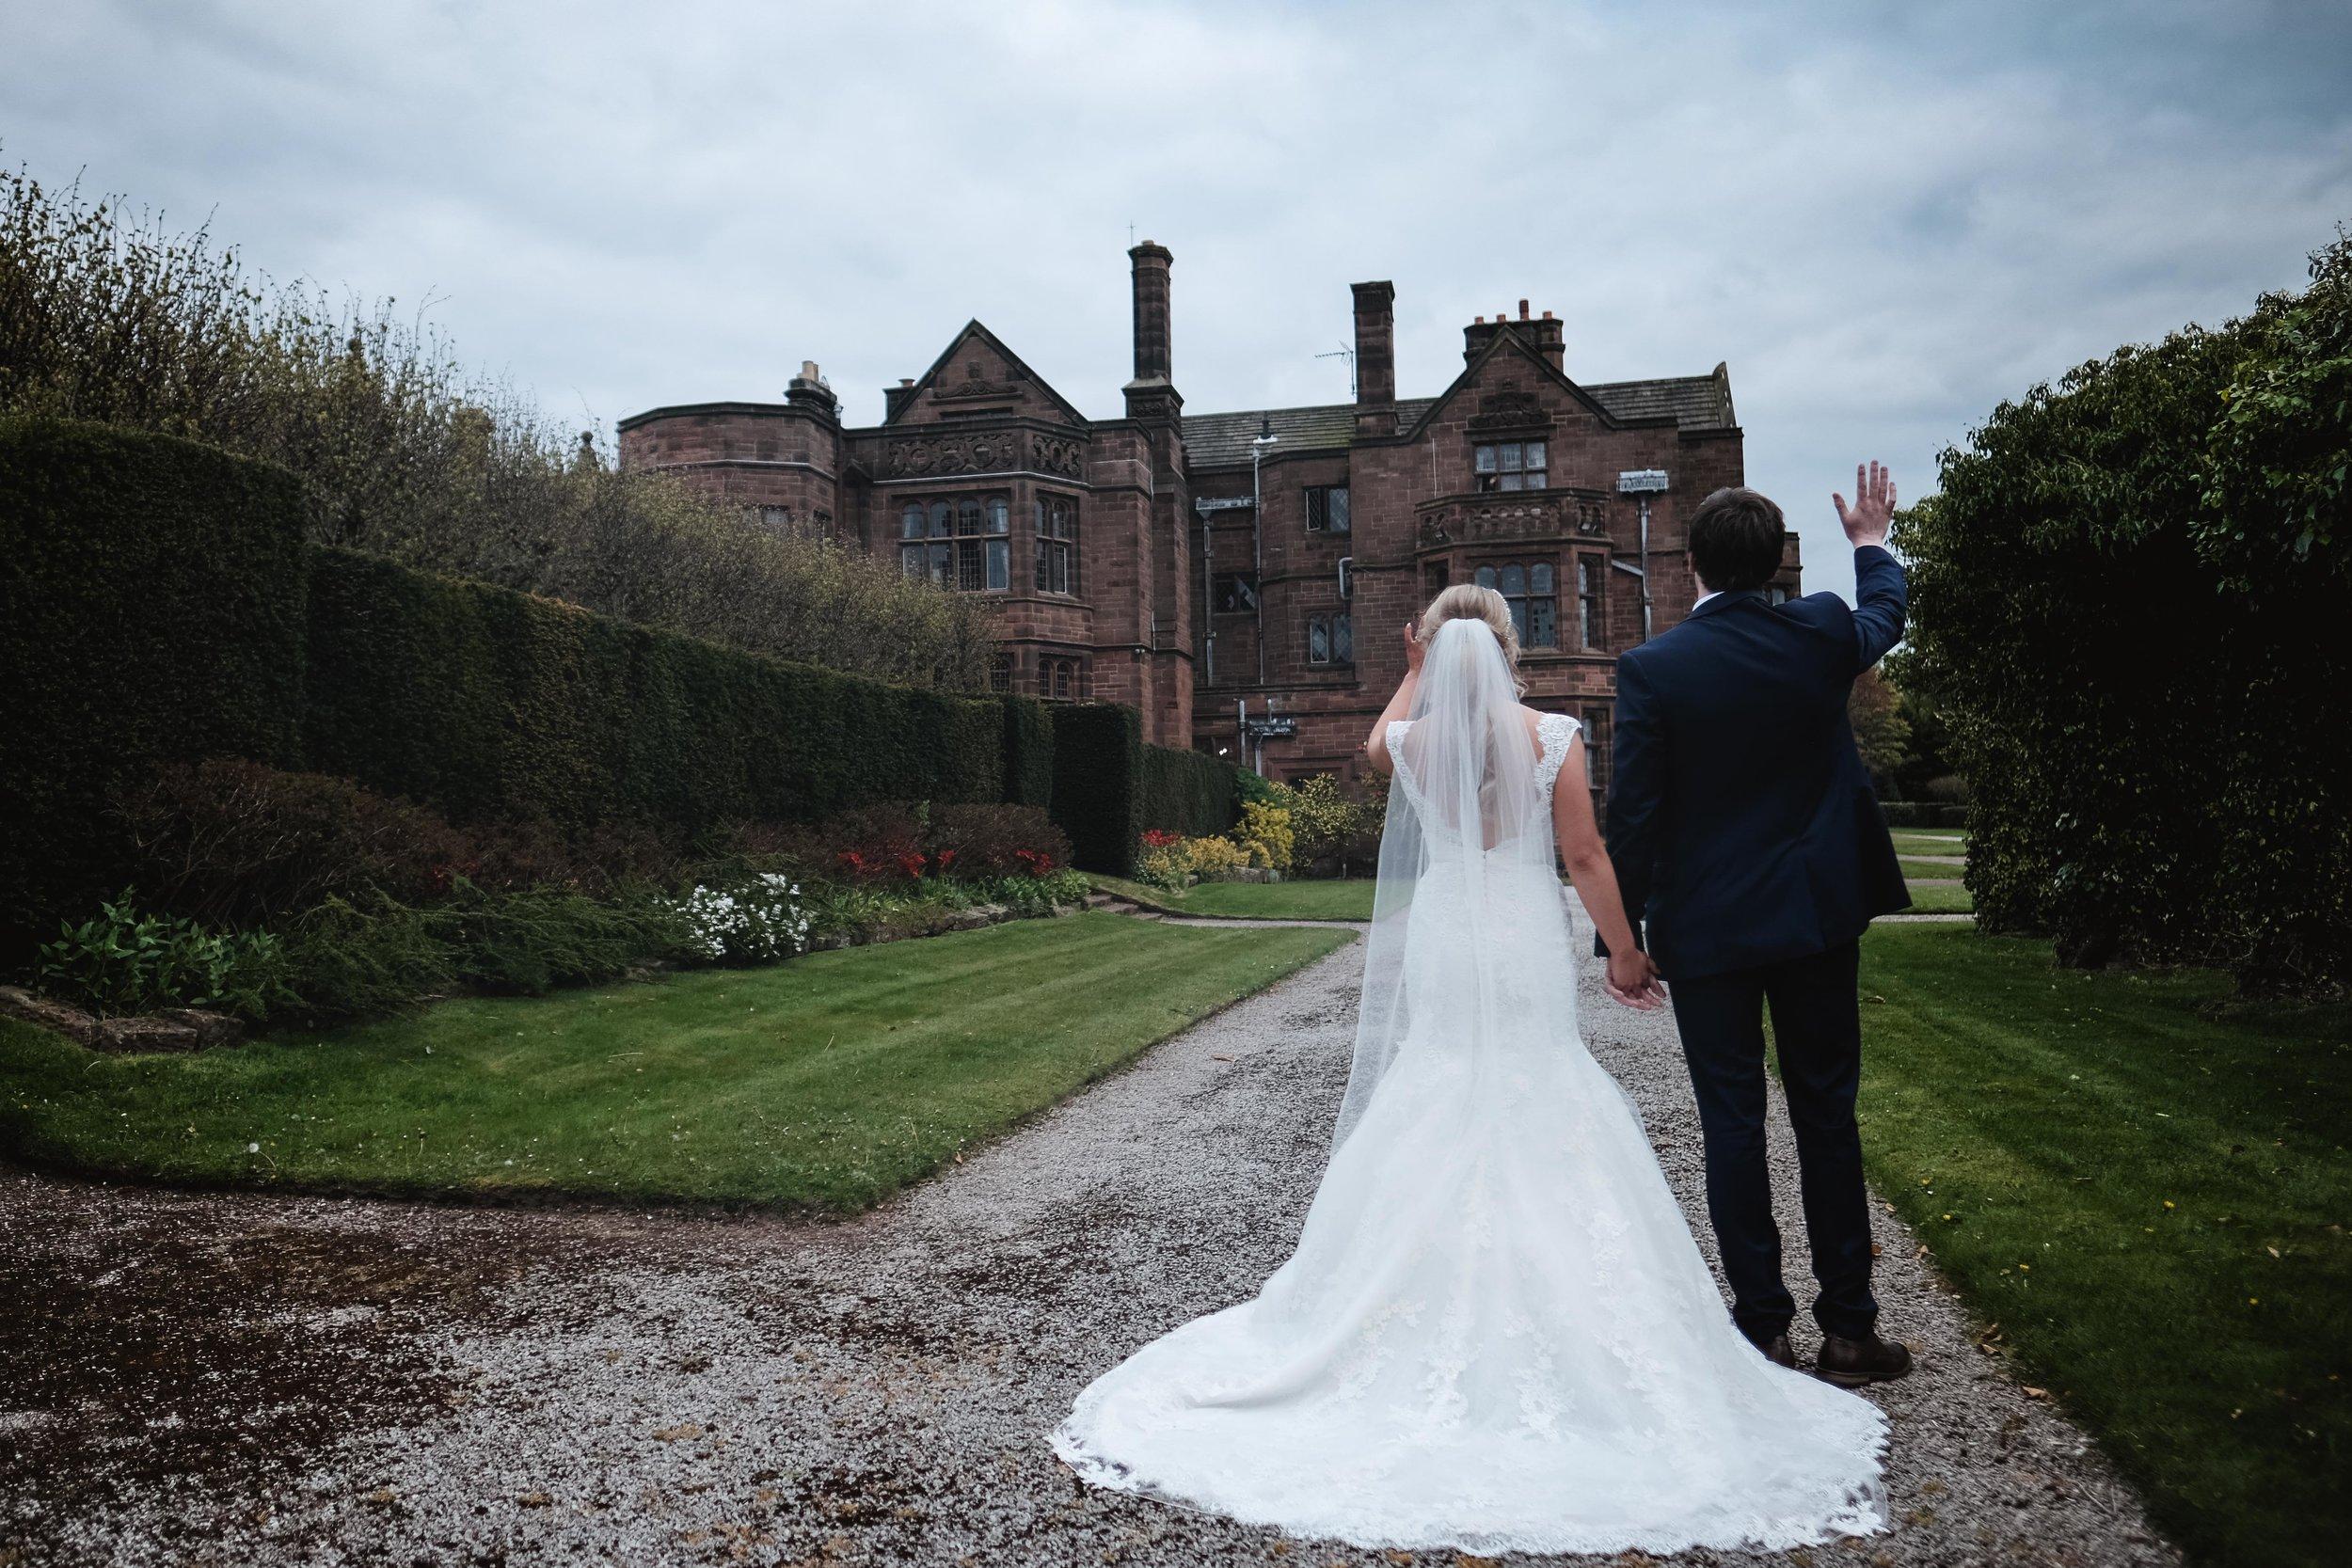 Thornton manor wedding photography cheshire wedding photographer liverpool manchester warrington chester wirral wedding BLOG (81 of 108).jpg